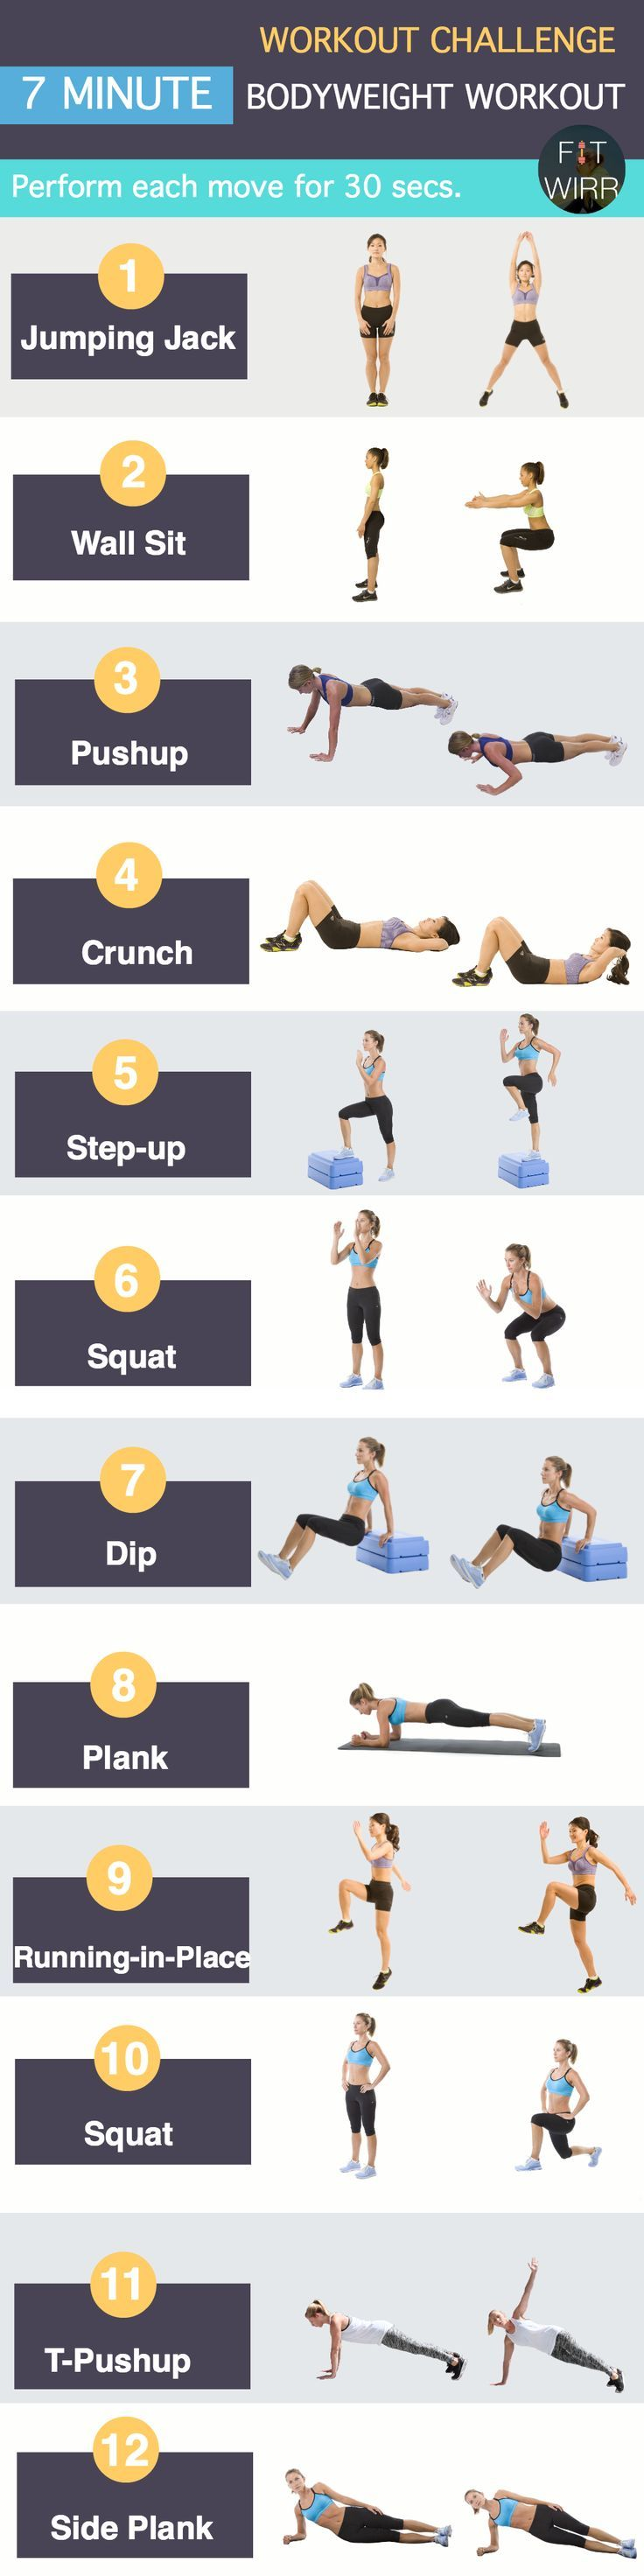 Seven Minute Workout Challenge // Detox Tea: www.skinnymetea.com.au